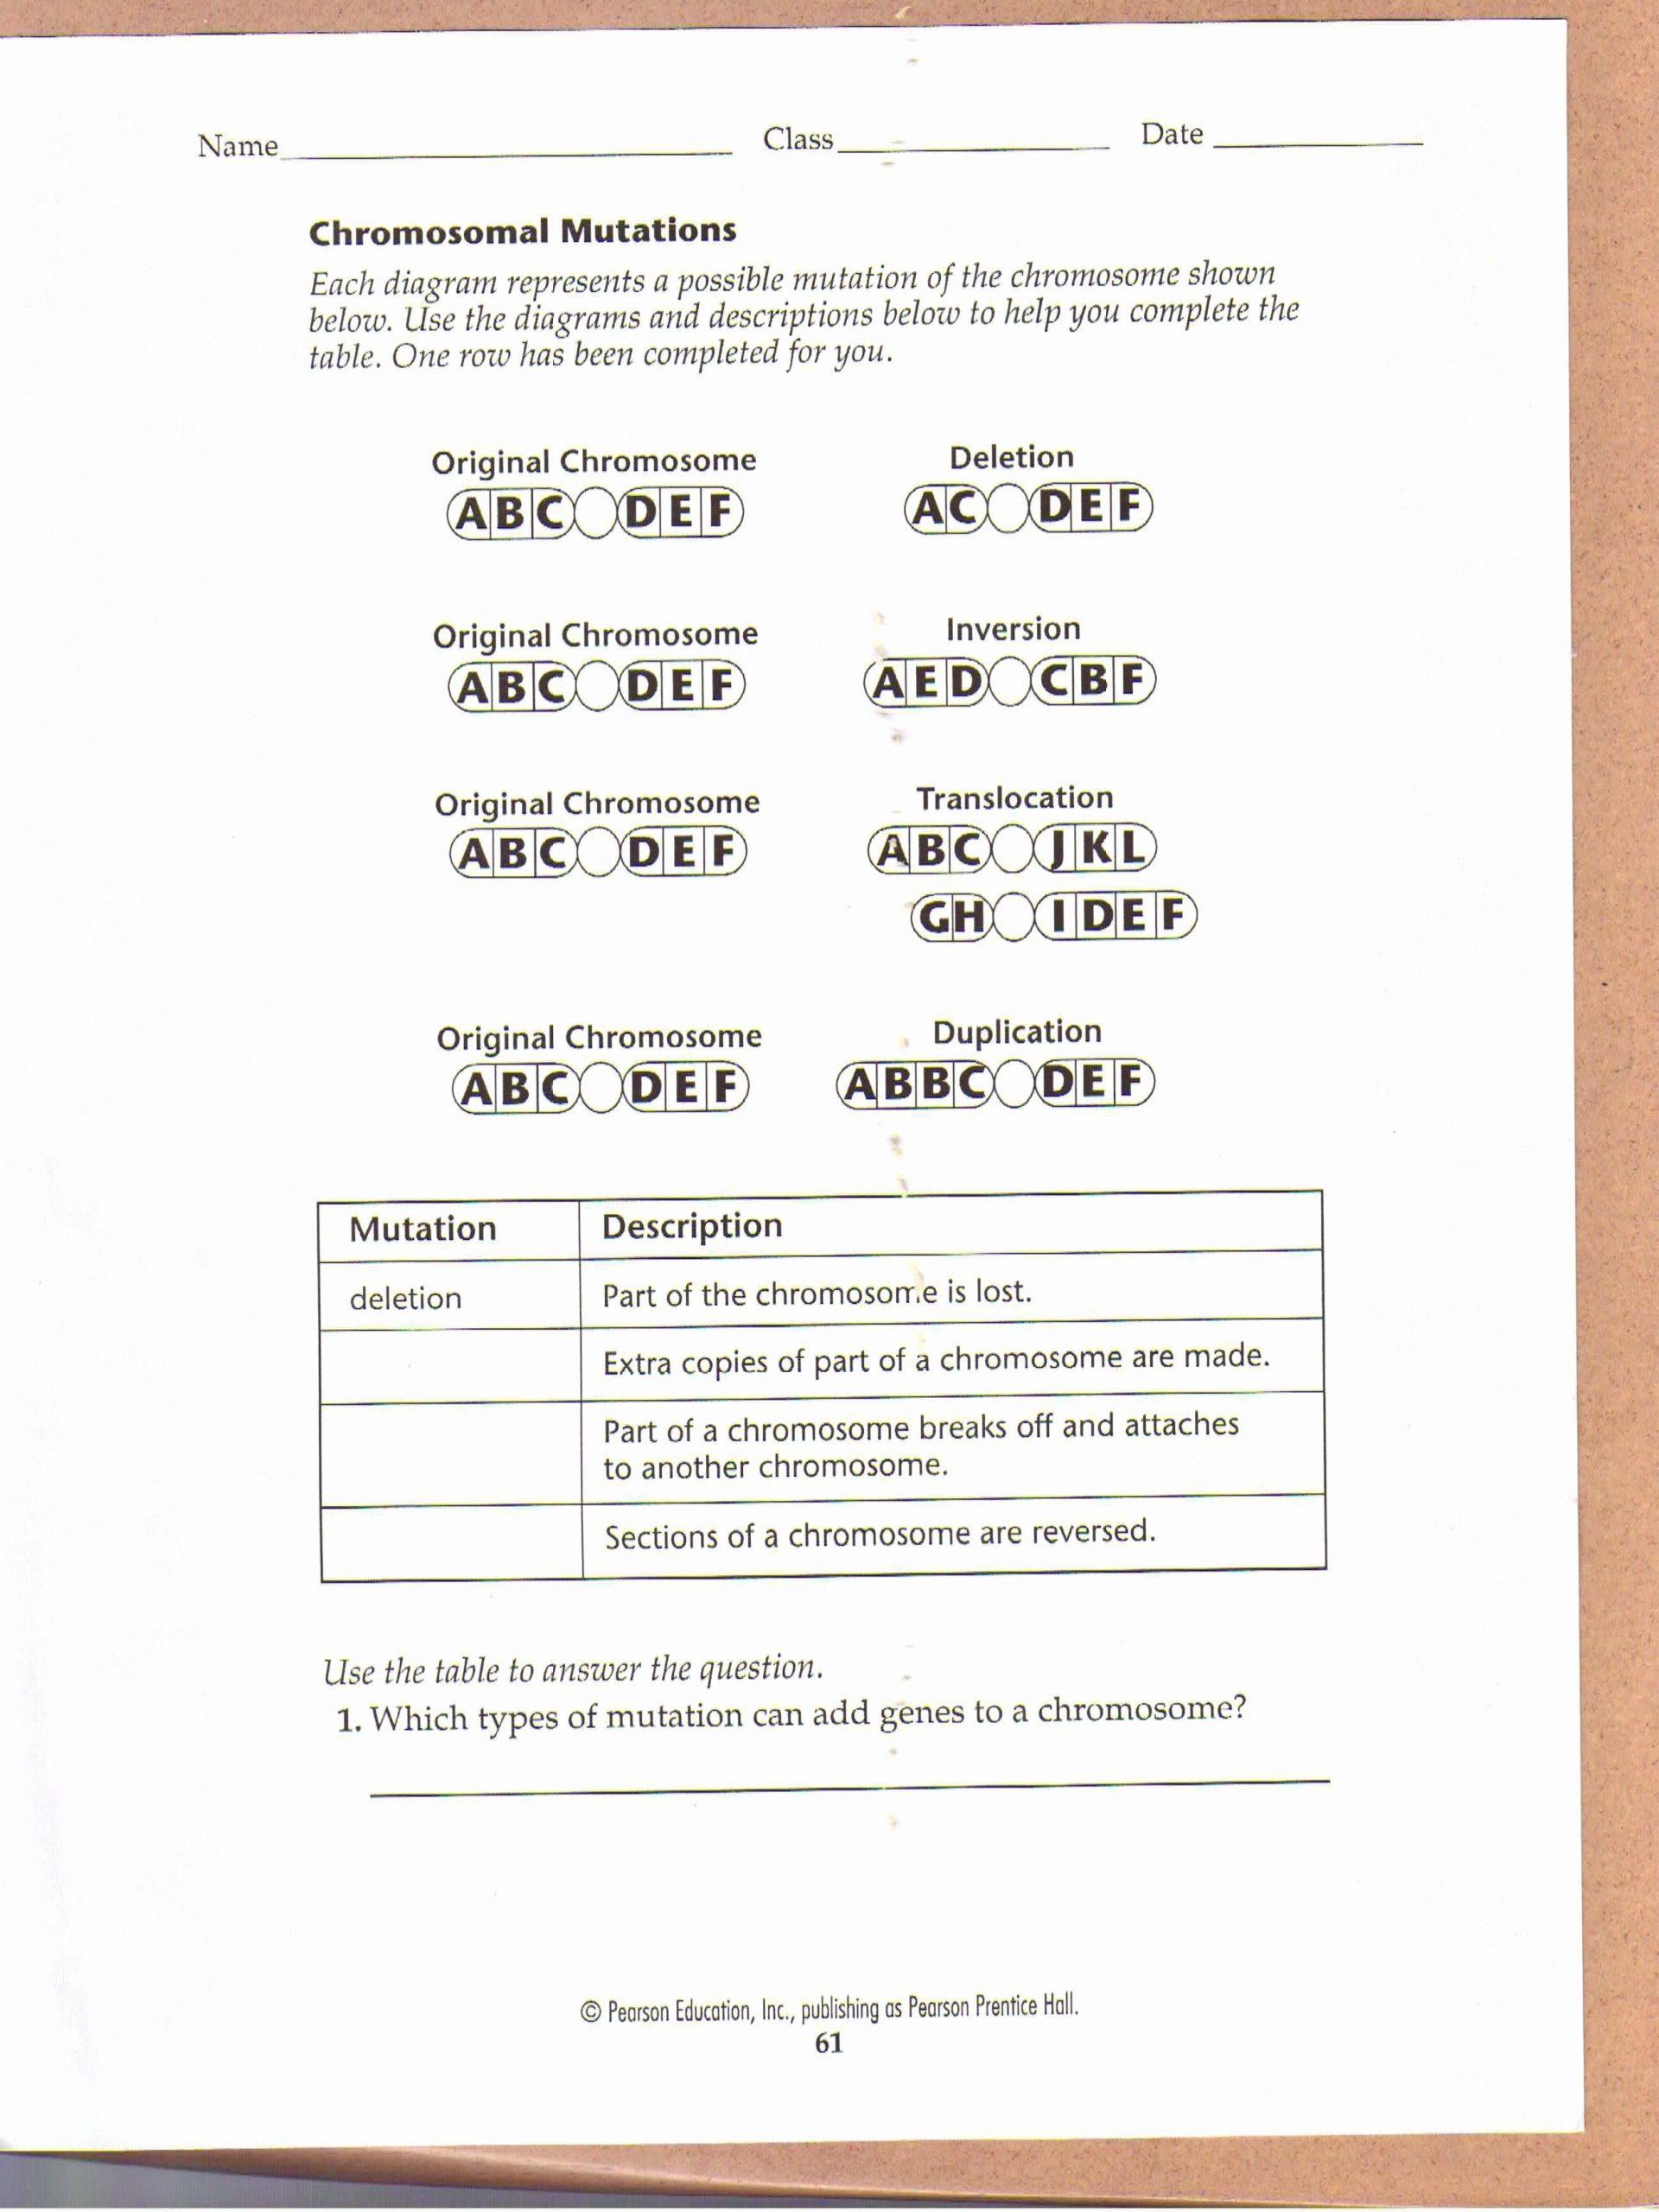 Mutations Worksheet Answer Key Genetic Mutation Worksheet Answer Key Inspirational